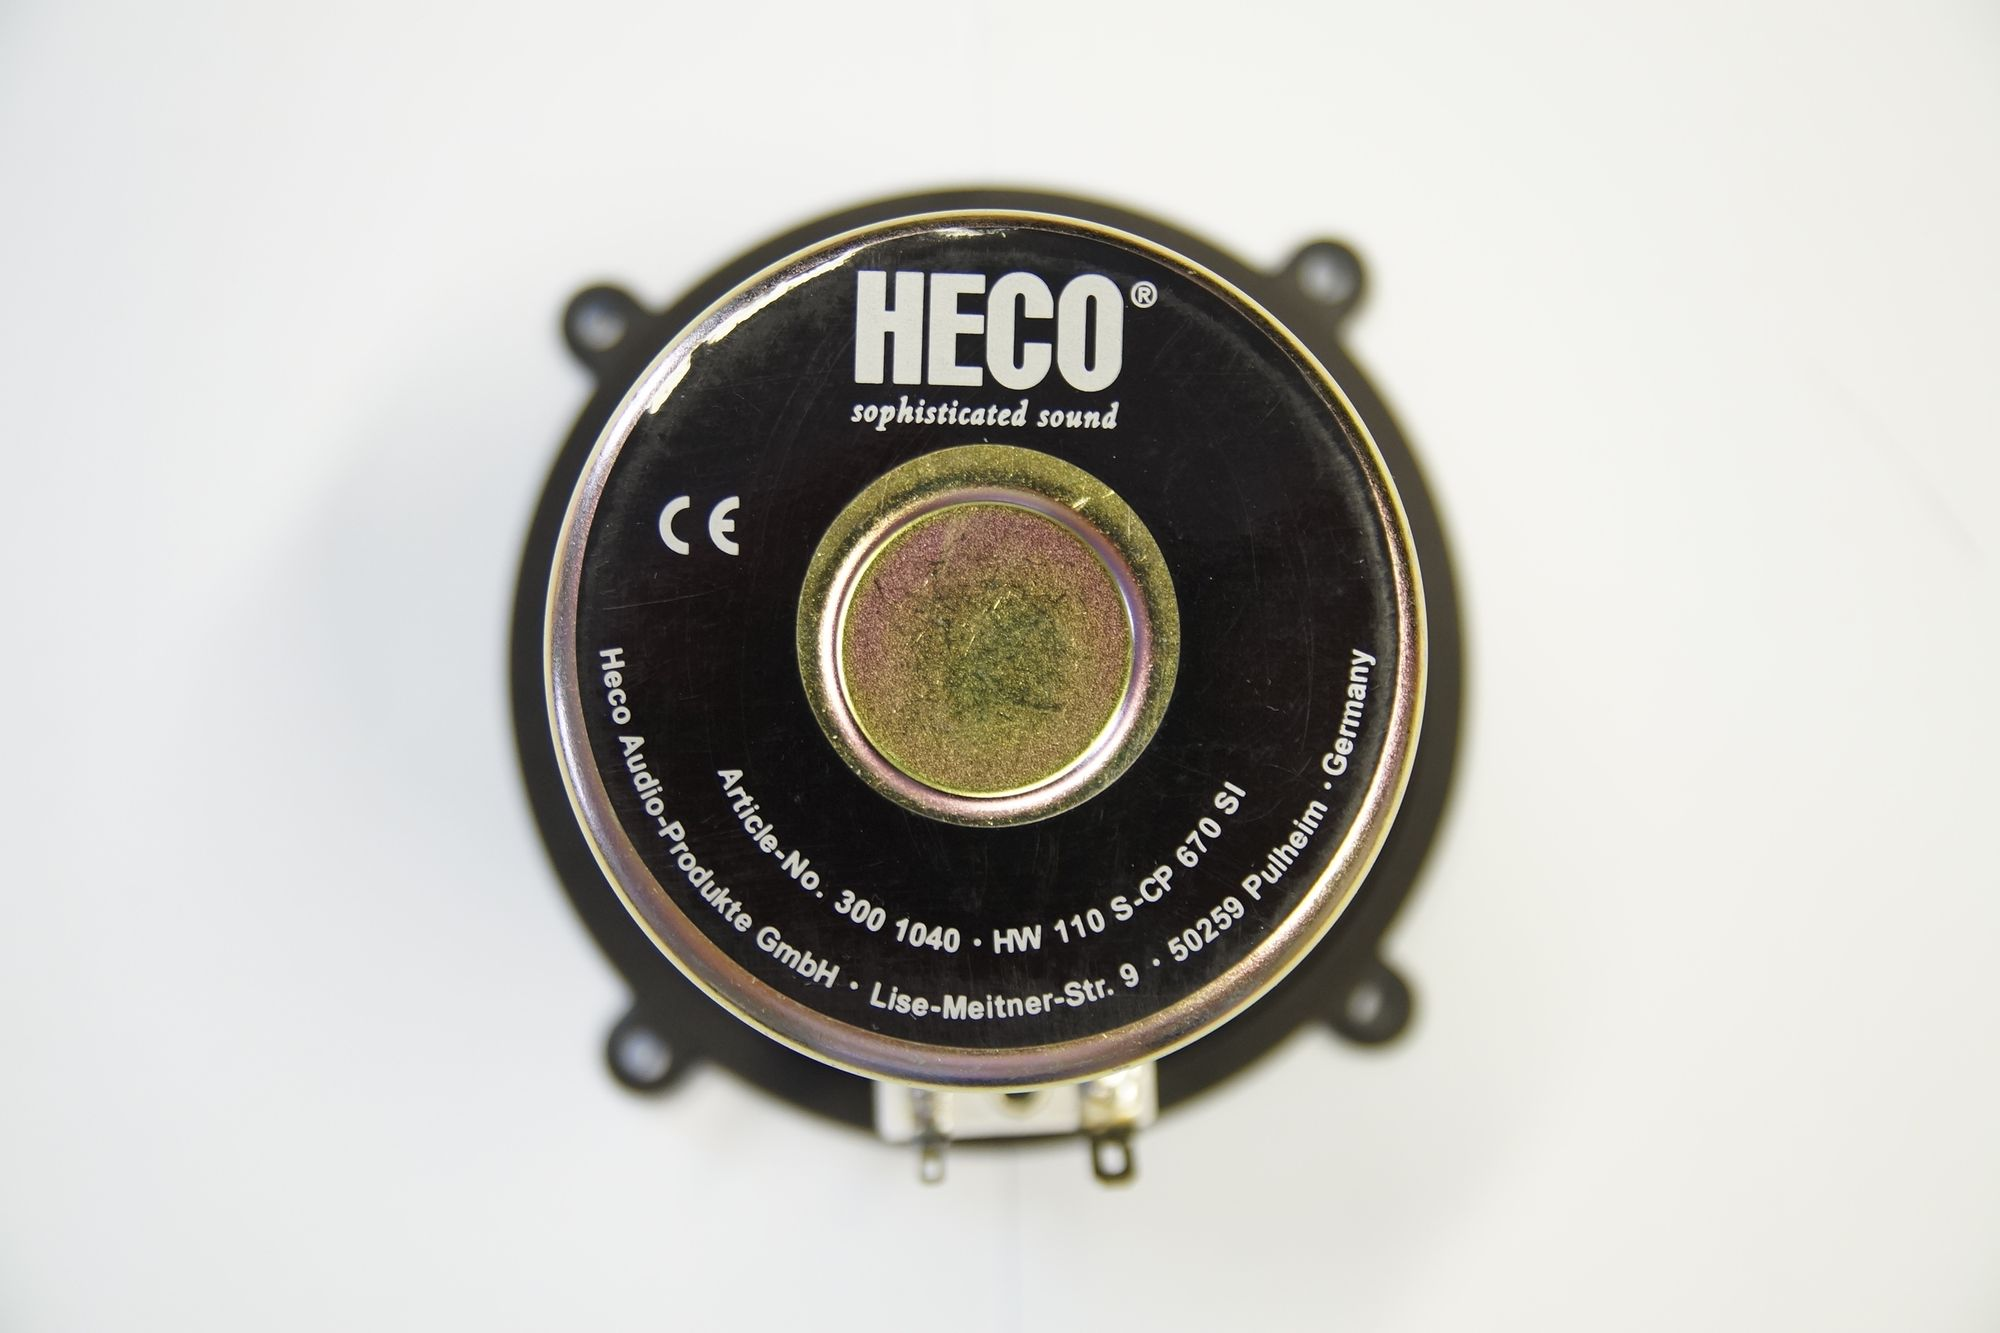 1 Paar Heco 110 mm Tiefmitteltöner HW110 S-CP 670 SI , Serviceware – Bild 3